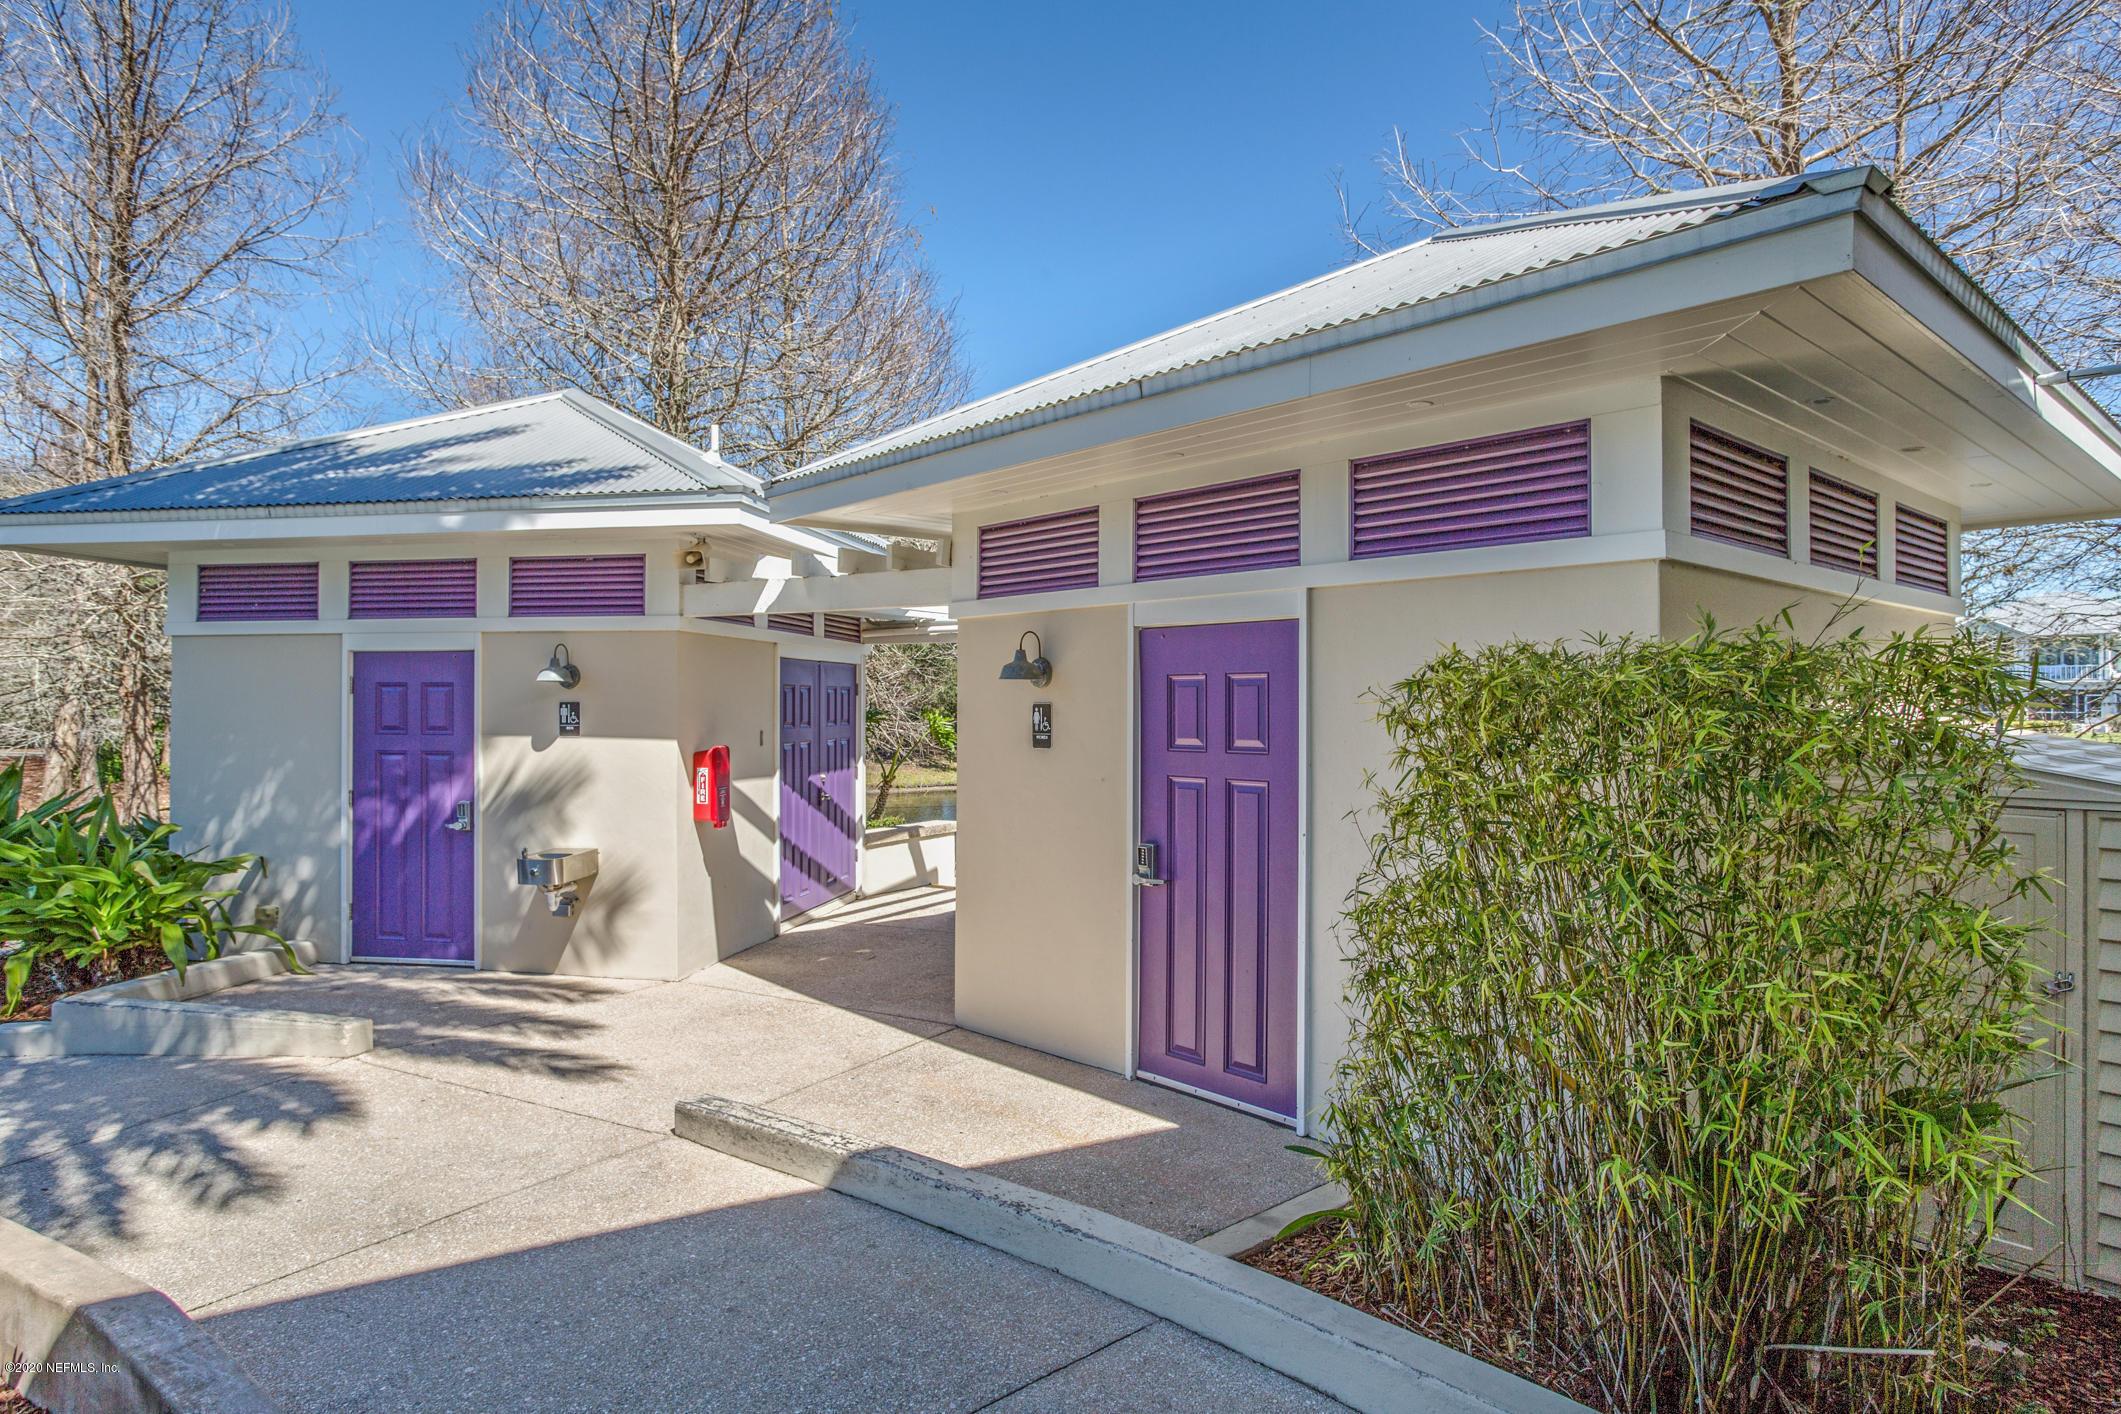 460 HIGH TIDE, ST AUGUSTINE, FLORIDA 32080, 3 Bedrooms Bedrooms, ,2 BathroomsBathrooms,Residential,For sale,HIGH TIDE,1062876